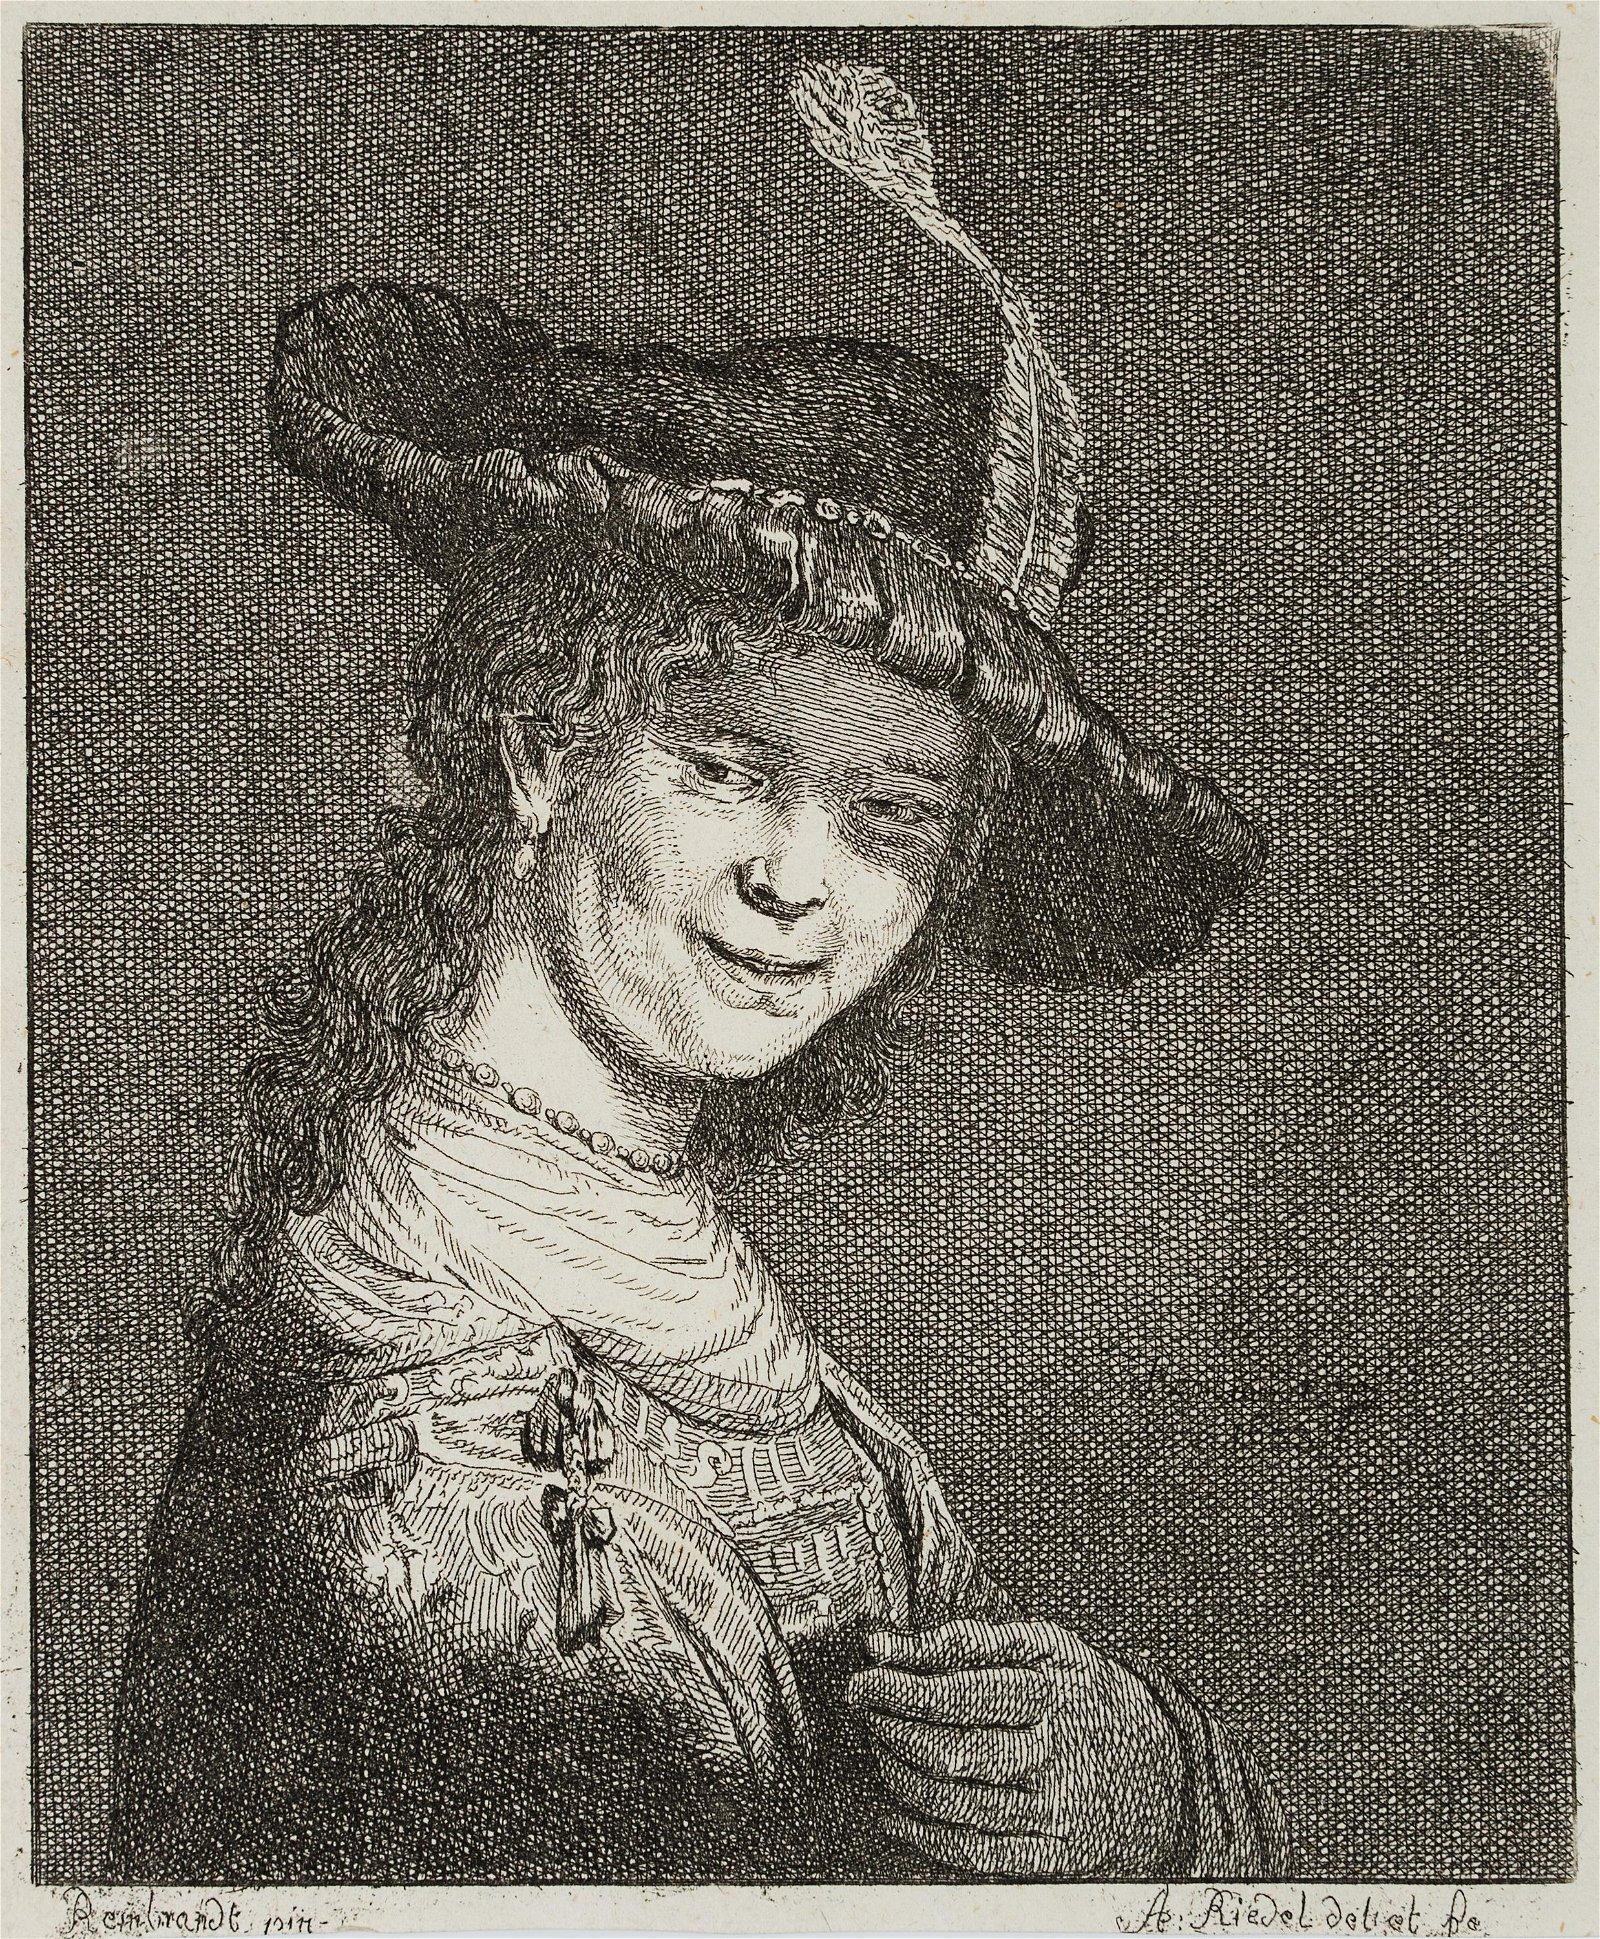 J.RIEDEL(*1736) after Rembrandt, Portrait of the